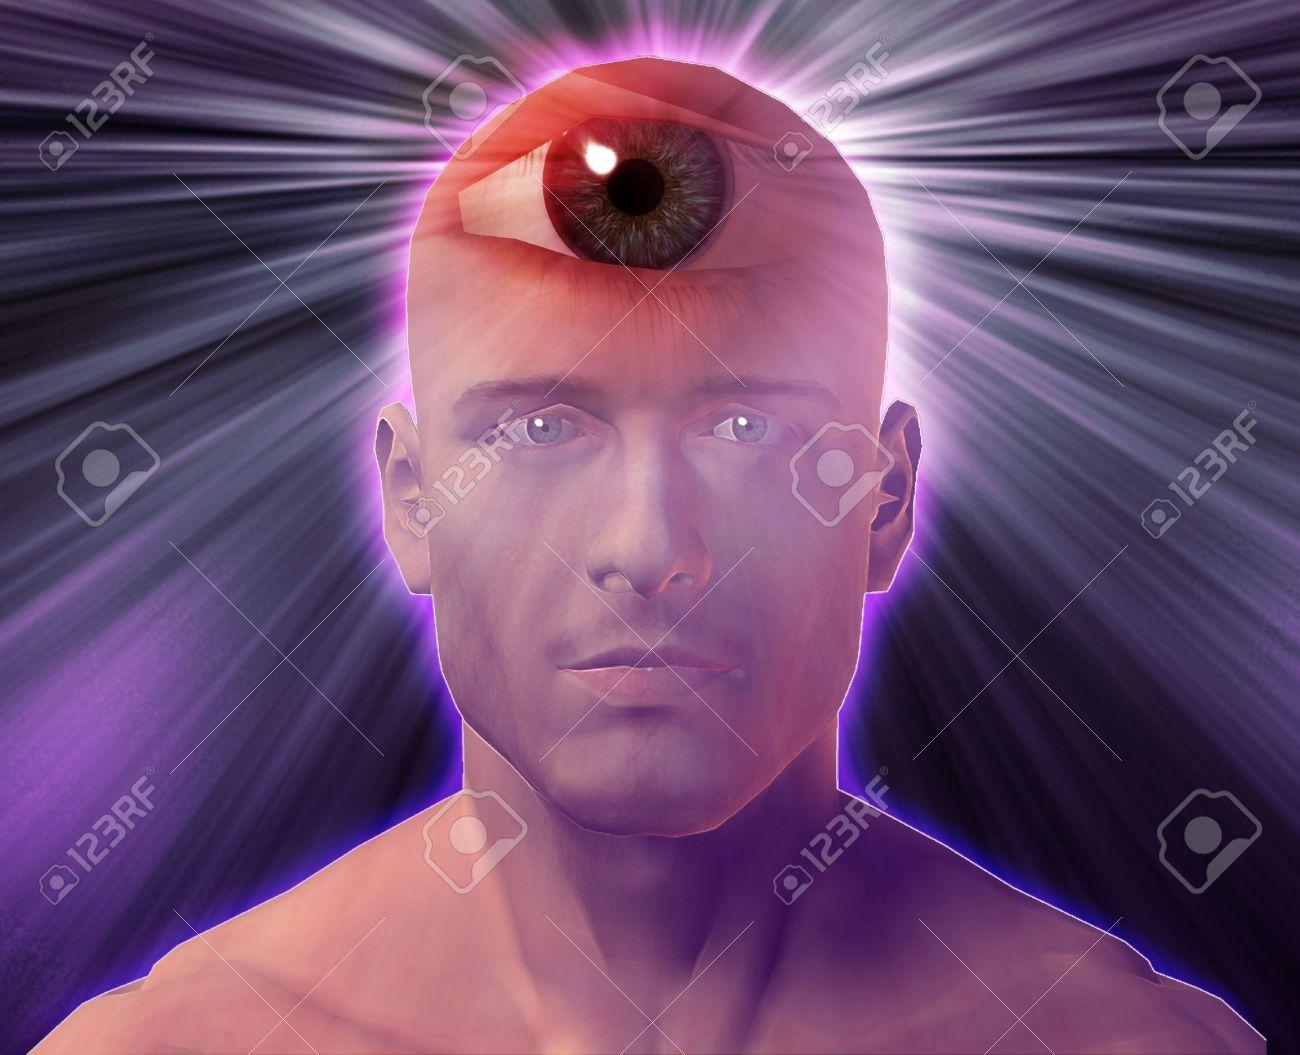 Man with third eye, psychic supernatural senses Stock Photo - 3725419